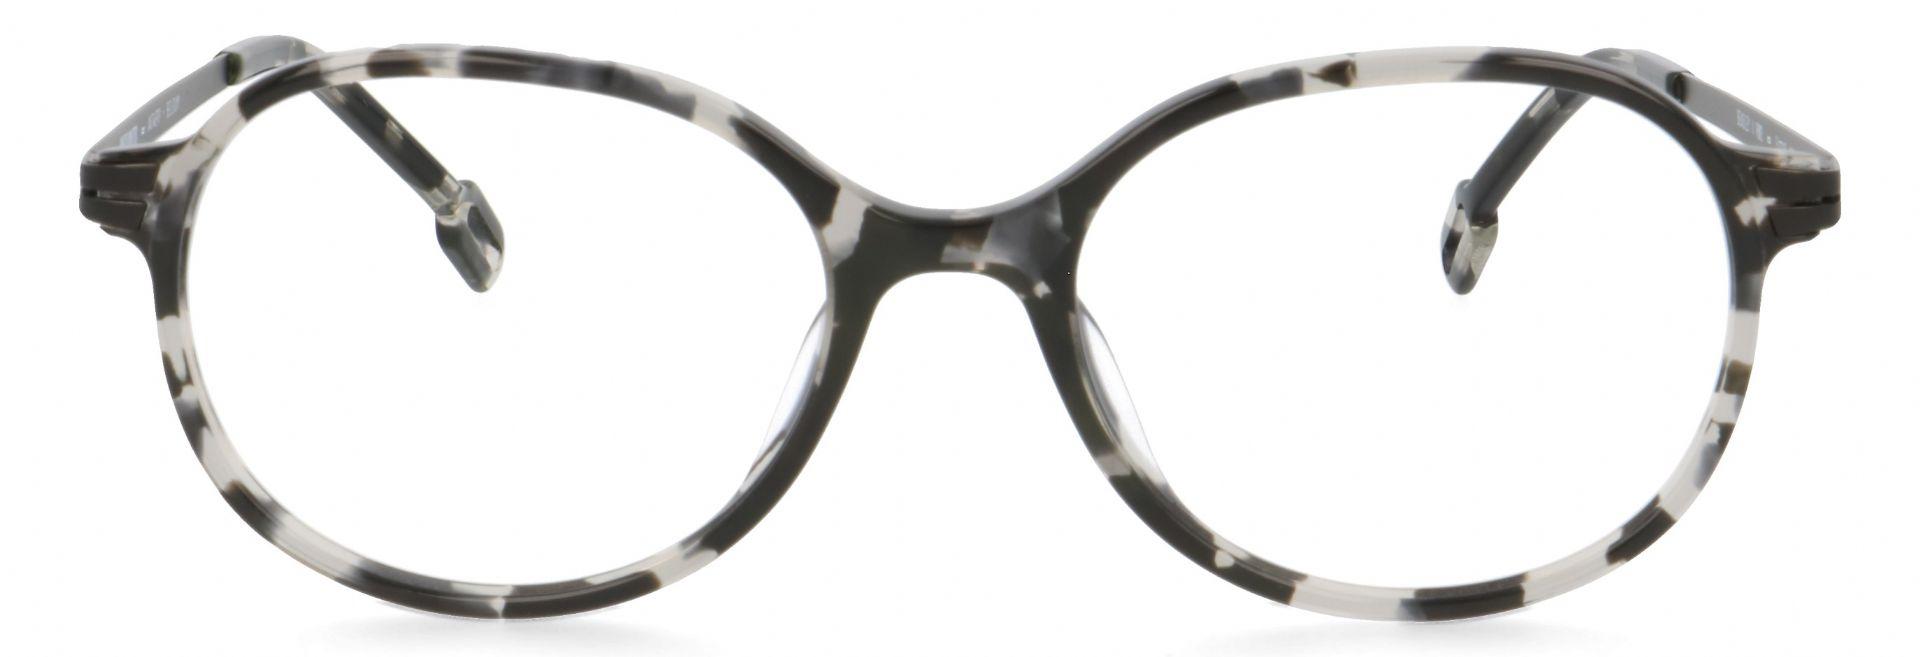 Beasley C122 // Odette Lunettes